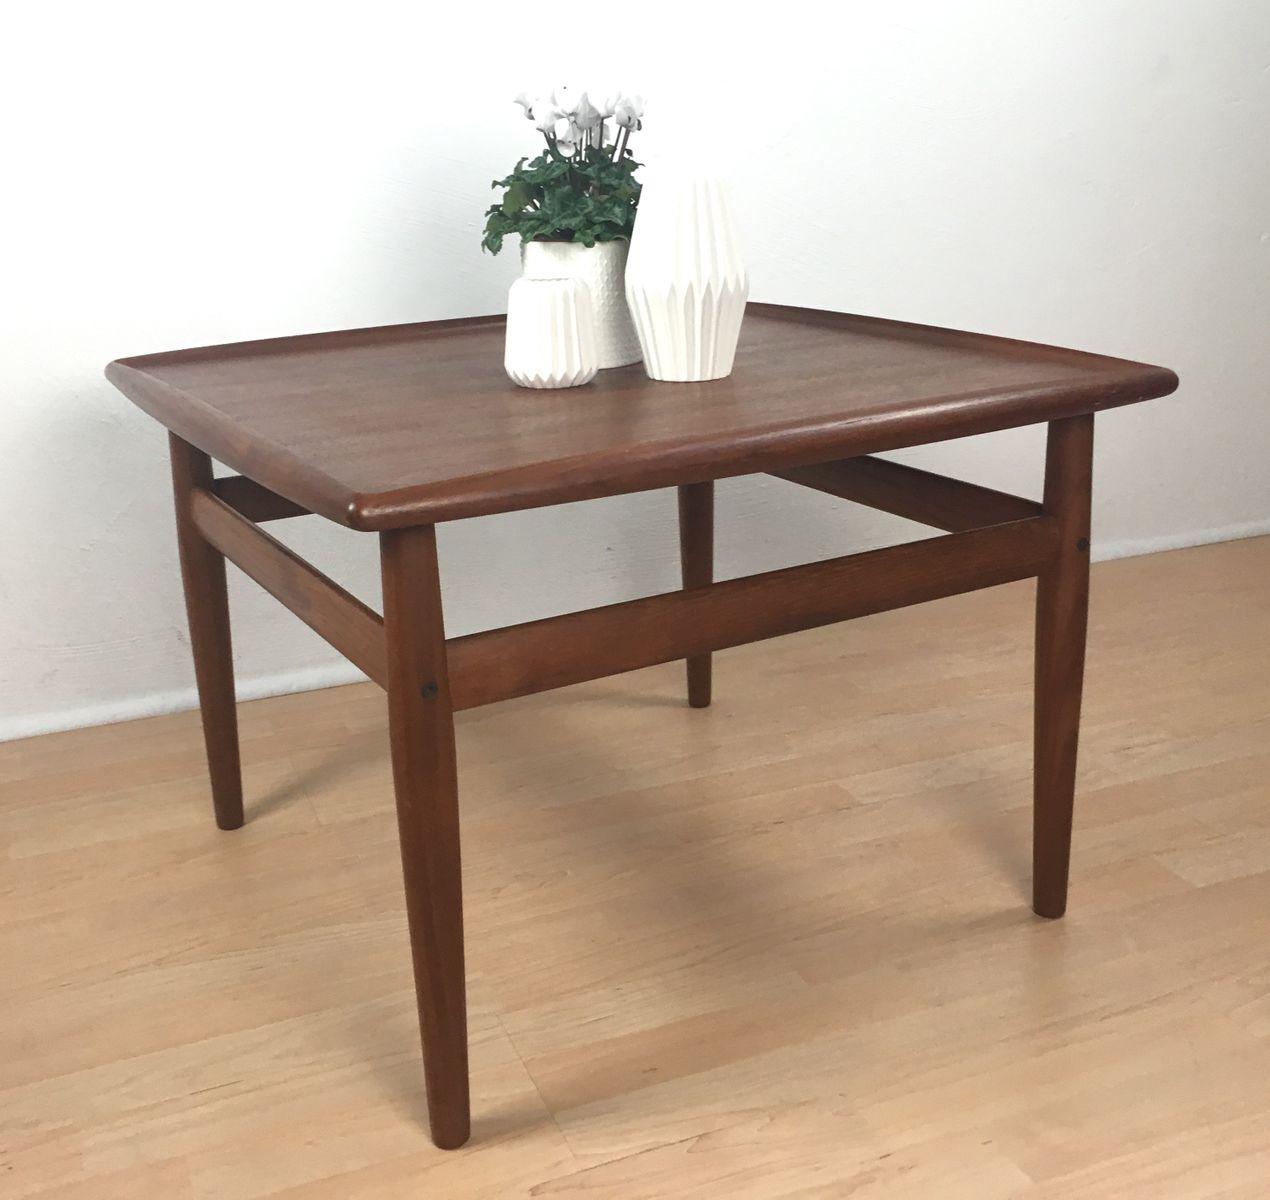 Vintage Teak Coffee Table By Grete Jalk For Glostrup